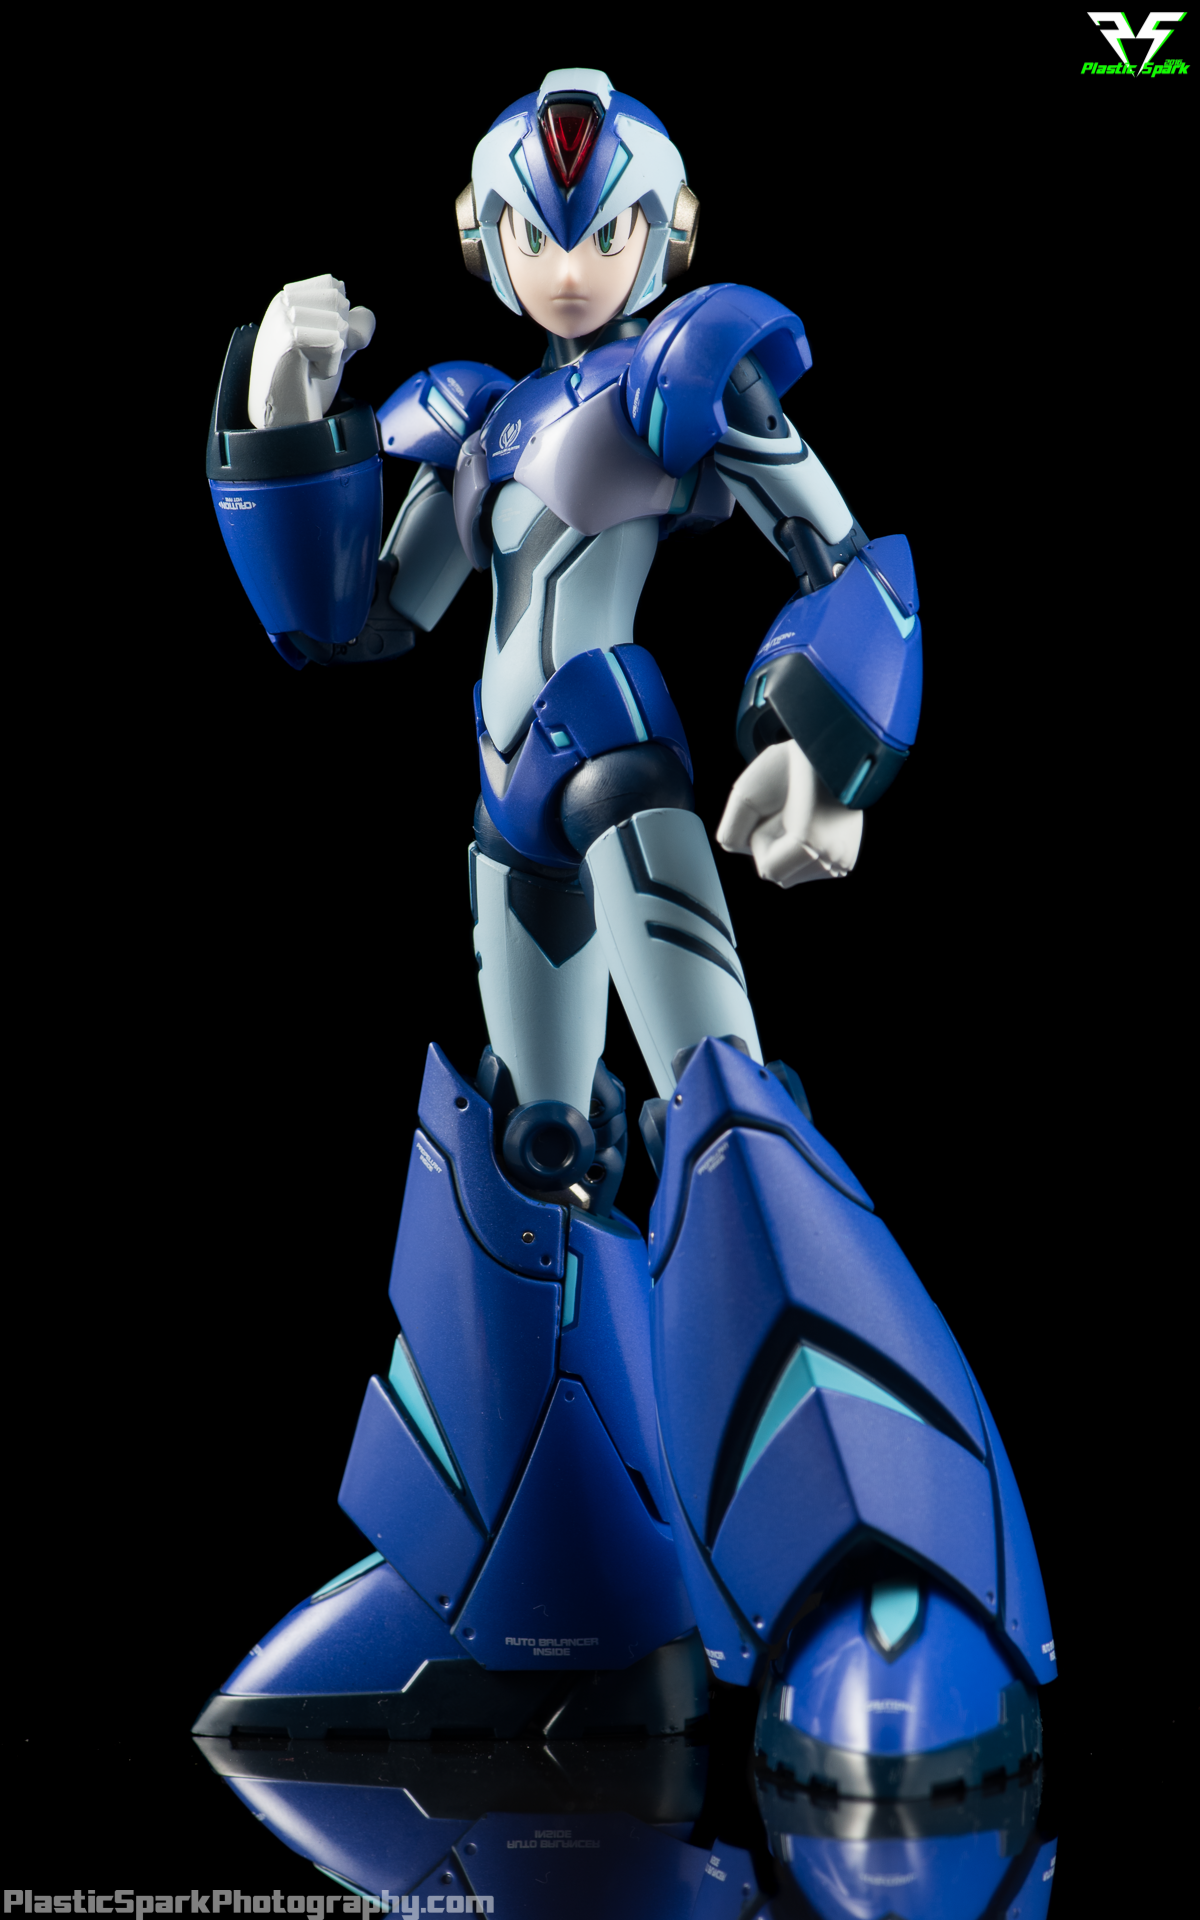 Truforce-Megaman-X-(3-of-17).png